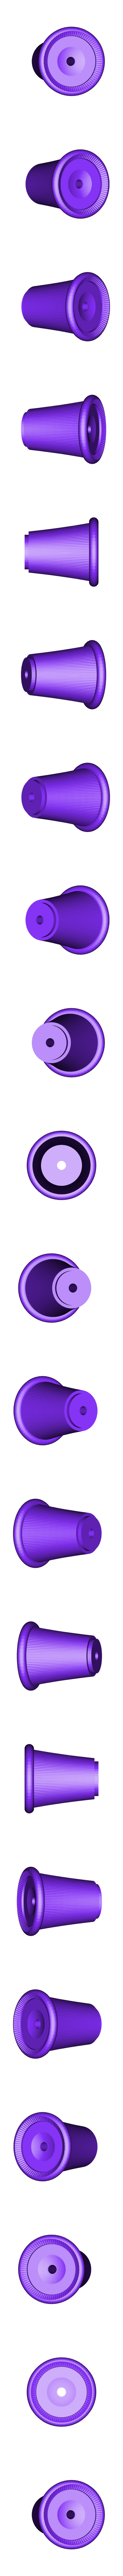 Trunk_D.stl Download free STL file Chandelier Iris • 3D printer design, Opossums